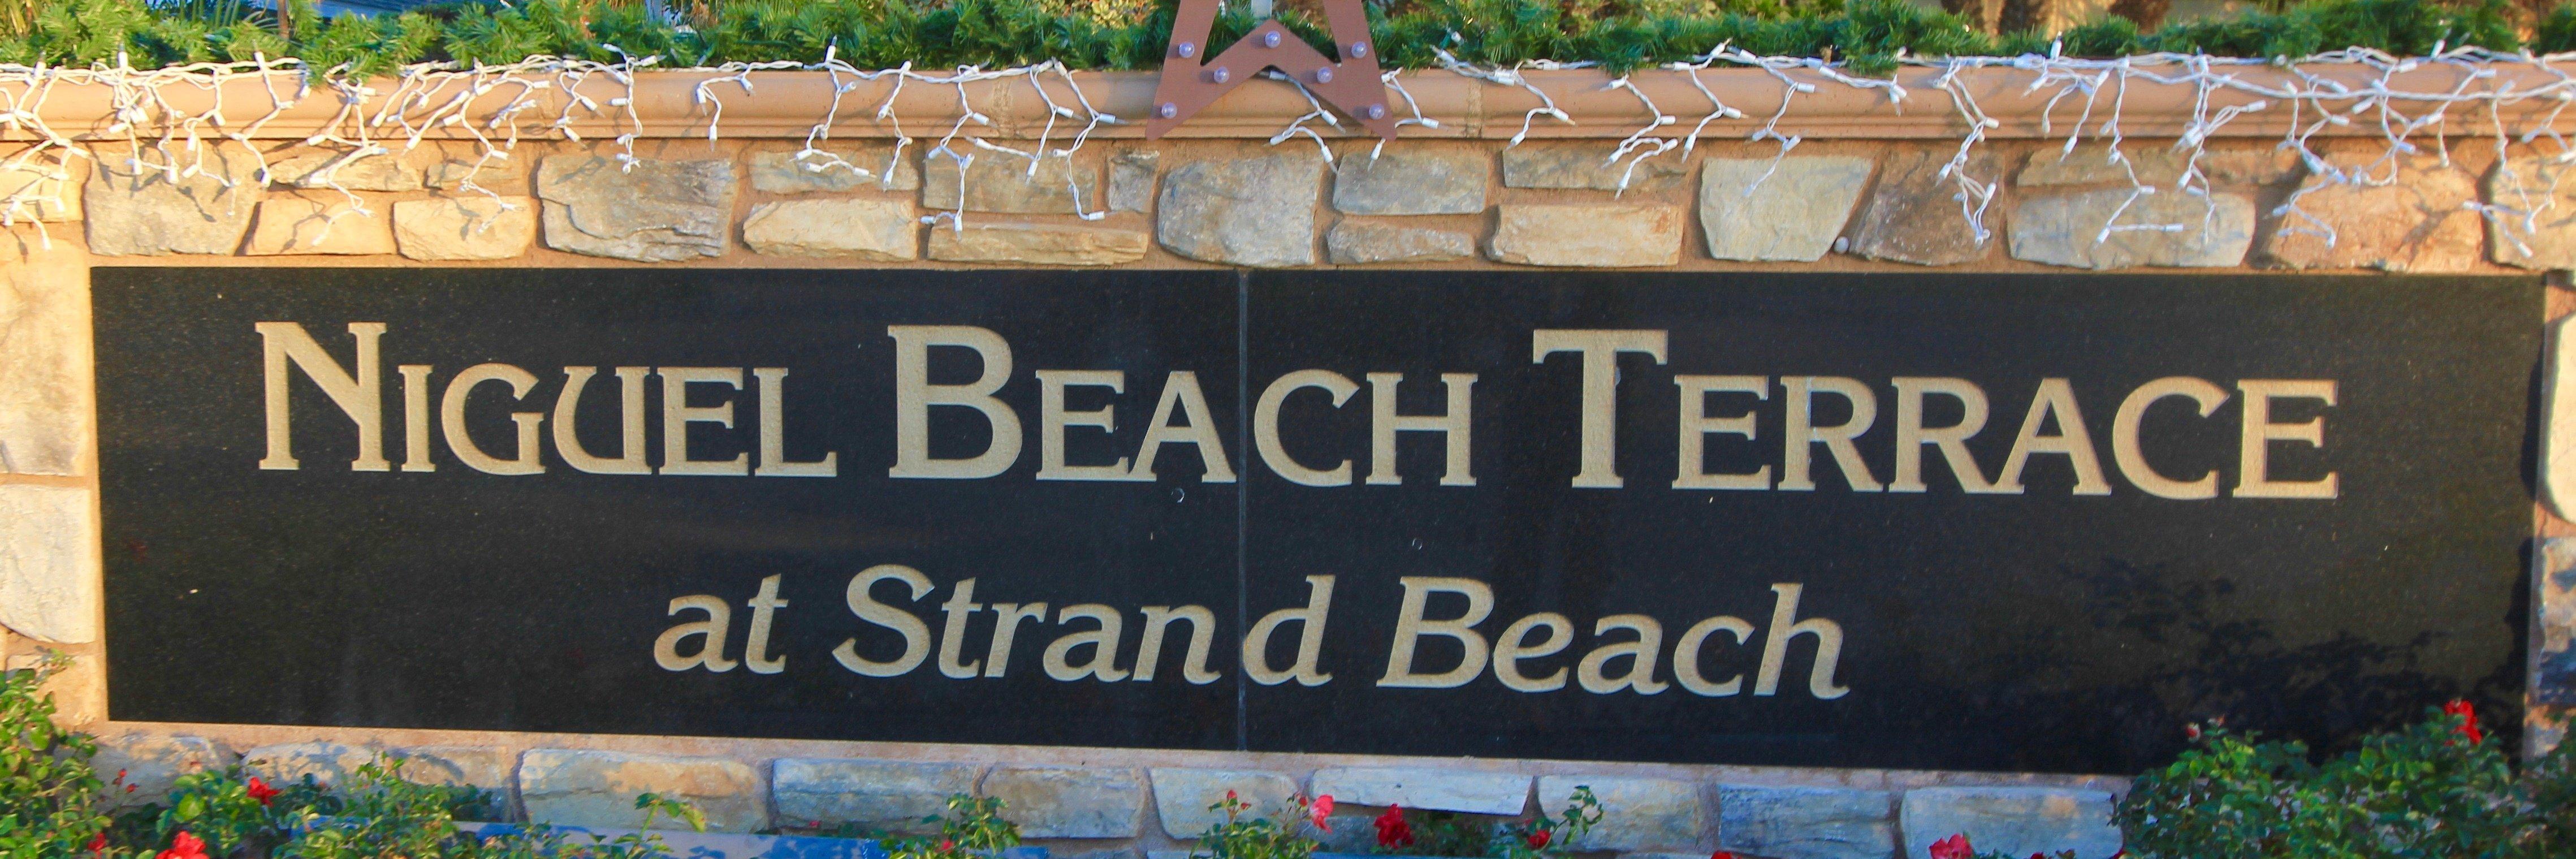 Niguel Beach Terrace Community Marquee located in Dana Point Ca